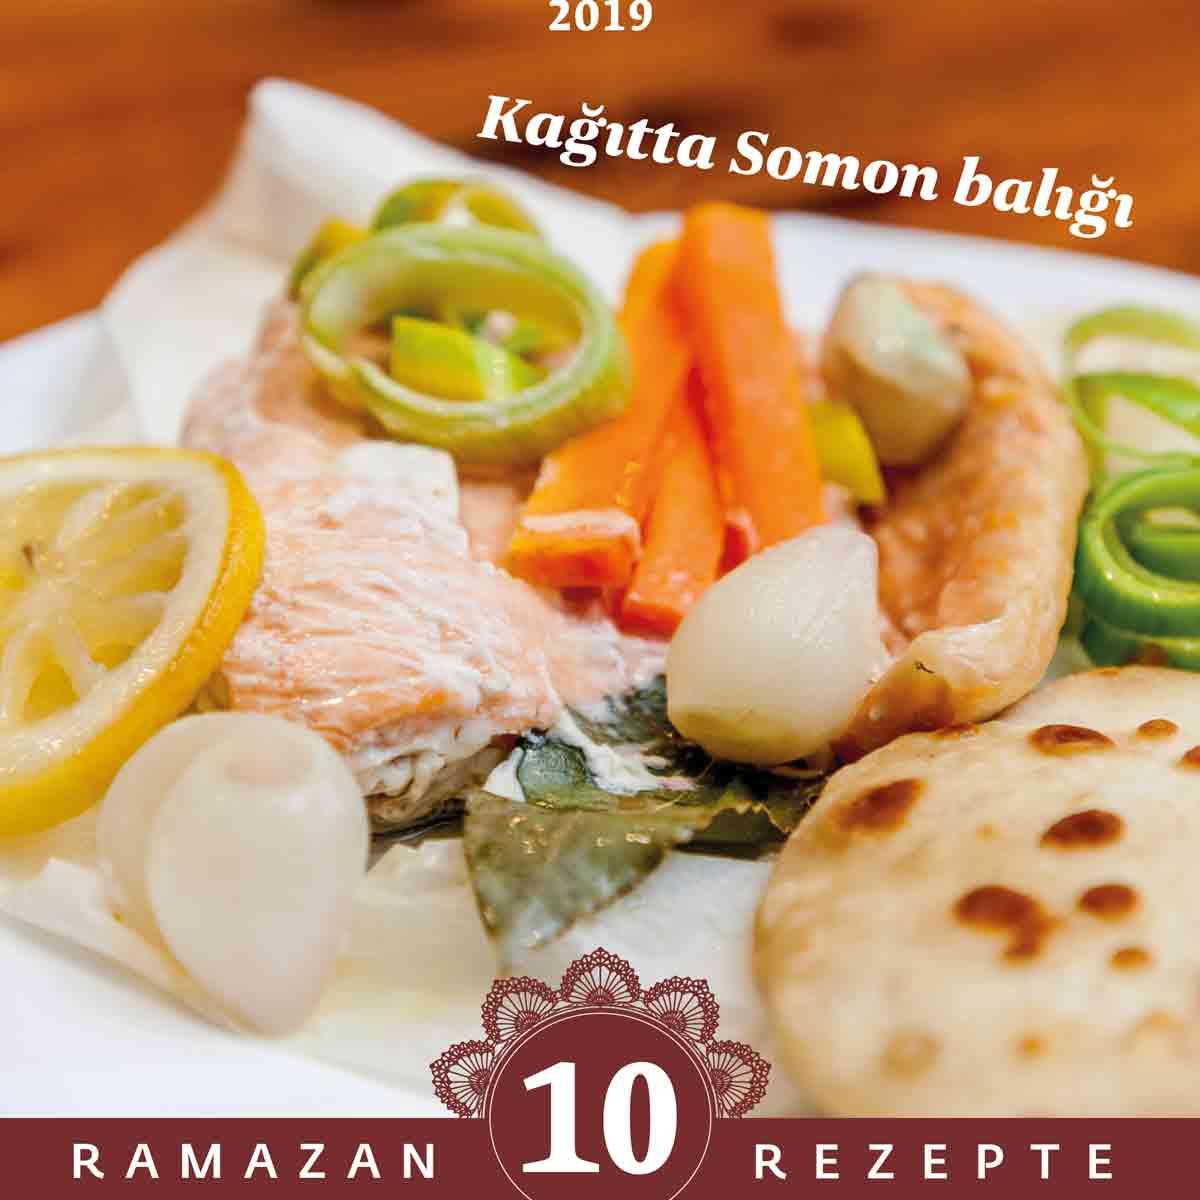 Ramadan 2019 jpeg 10